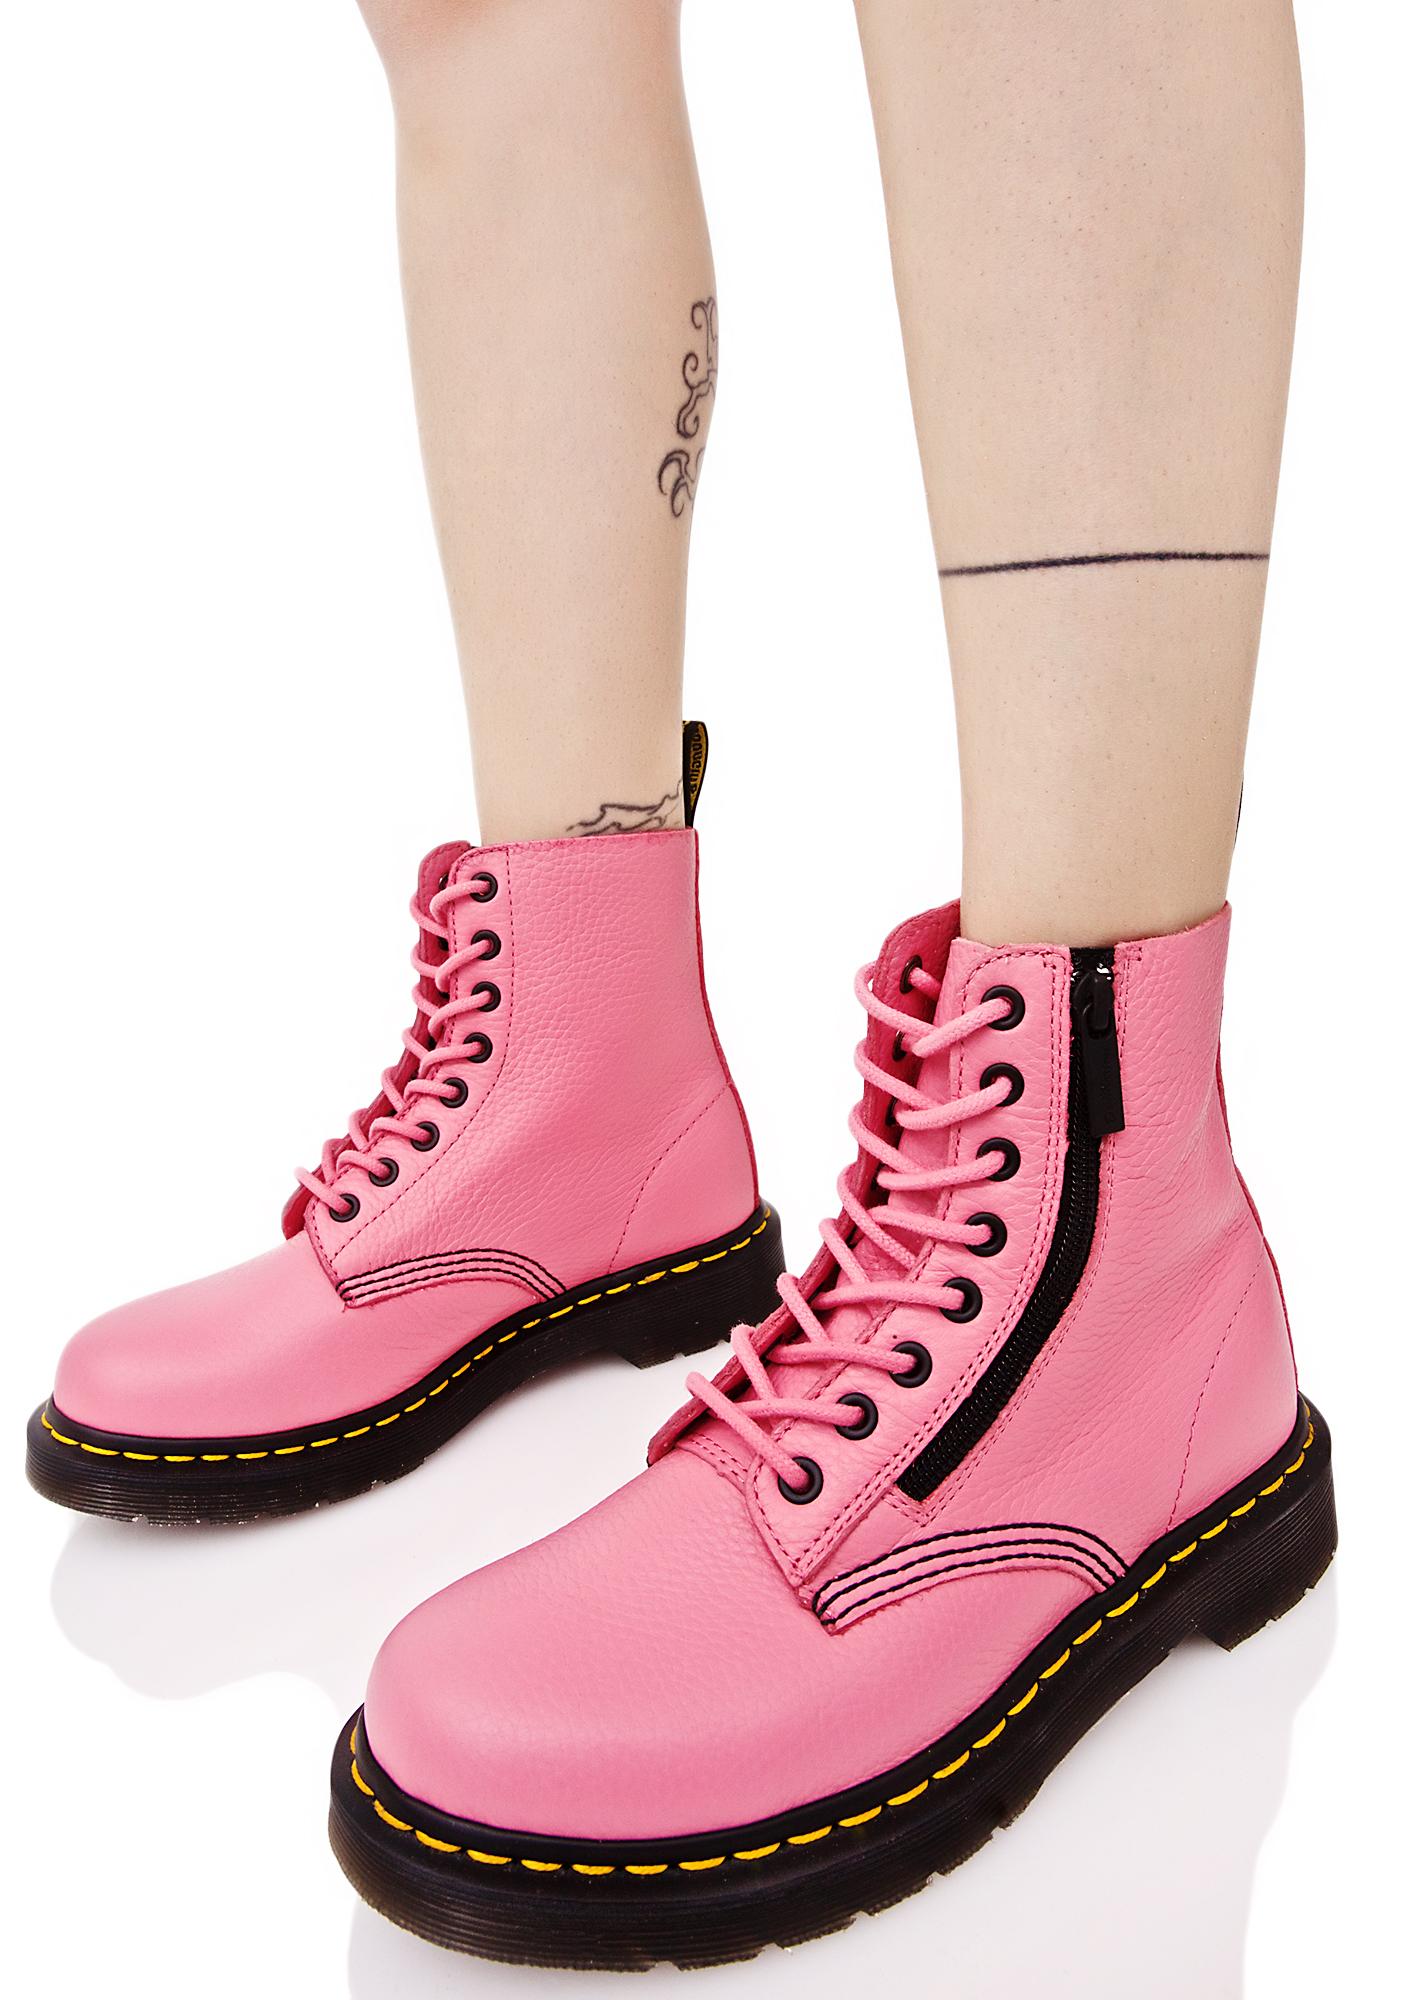 Dr. Martens Pink Zippered Pascal 8 Eye Boots